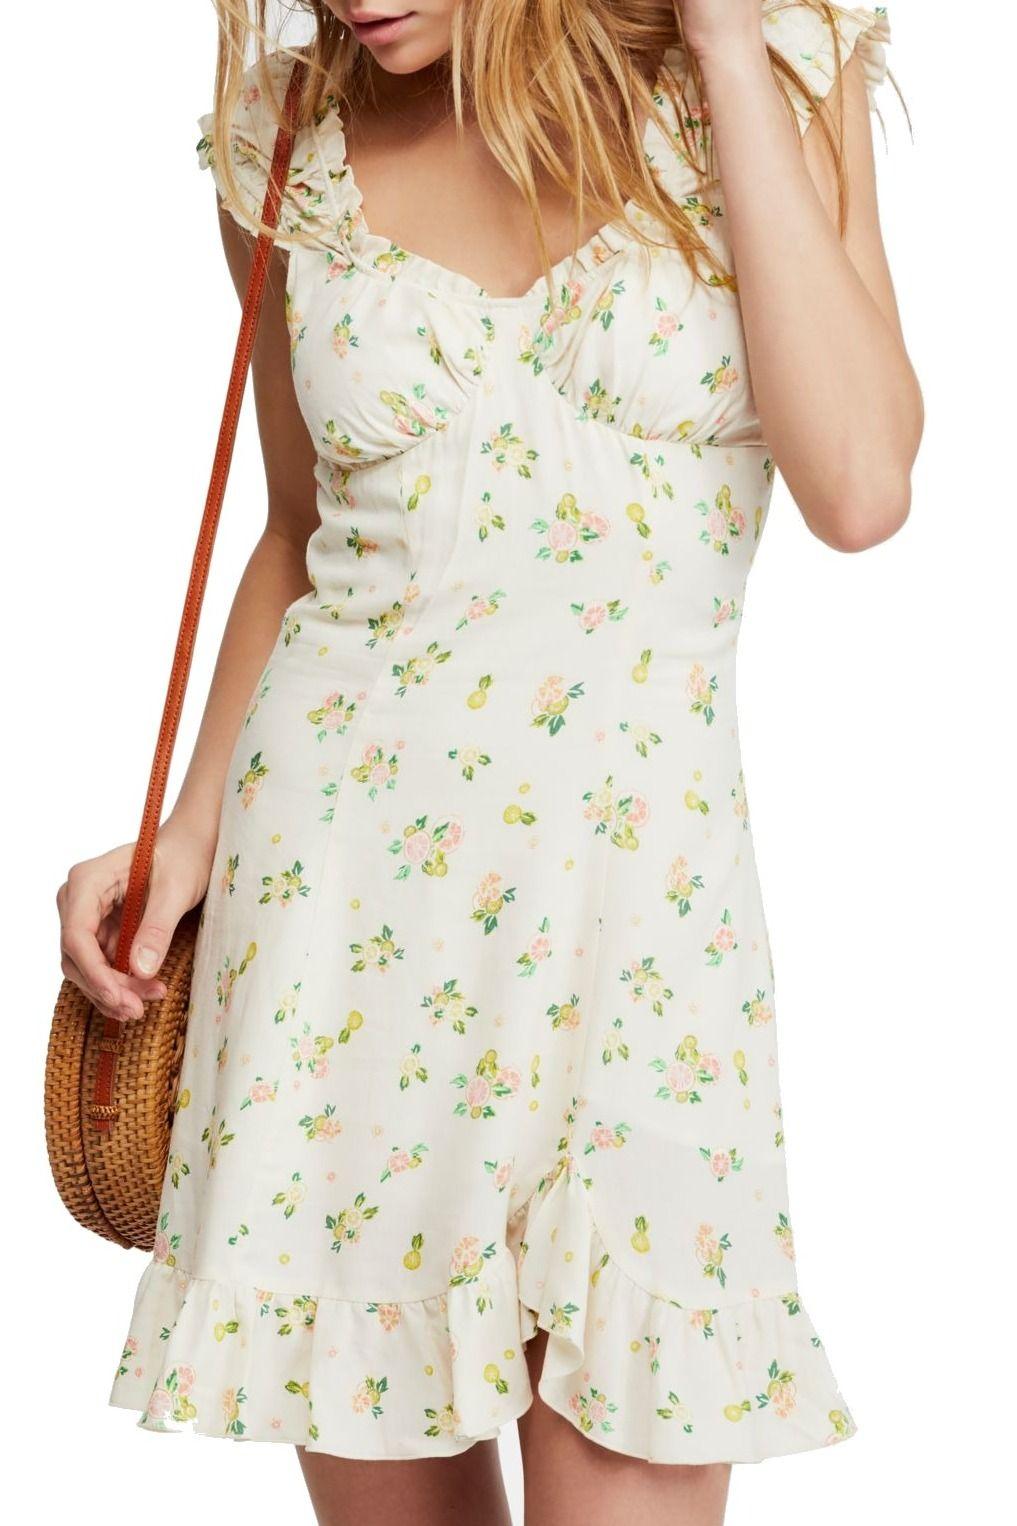 Free People Women's Dress Ivory Size Large L Citrus Print Flounce Hem